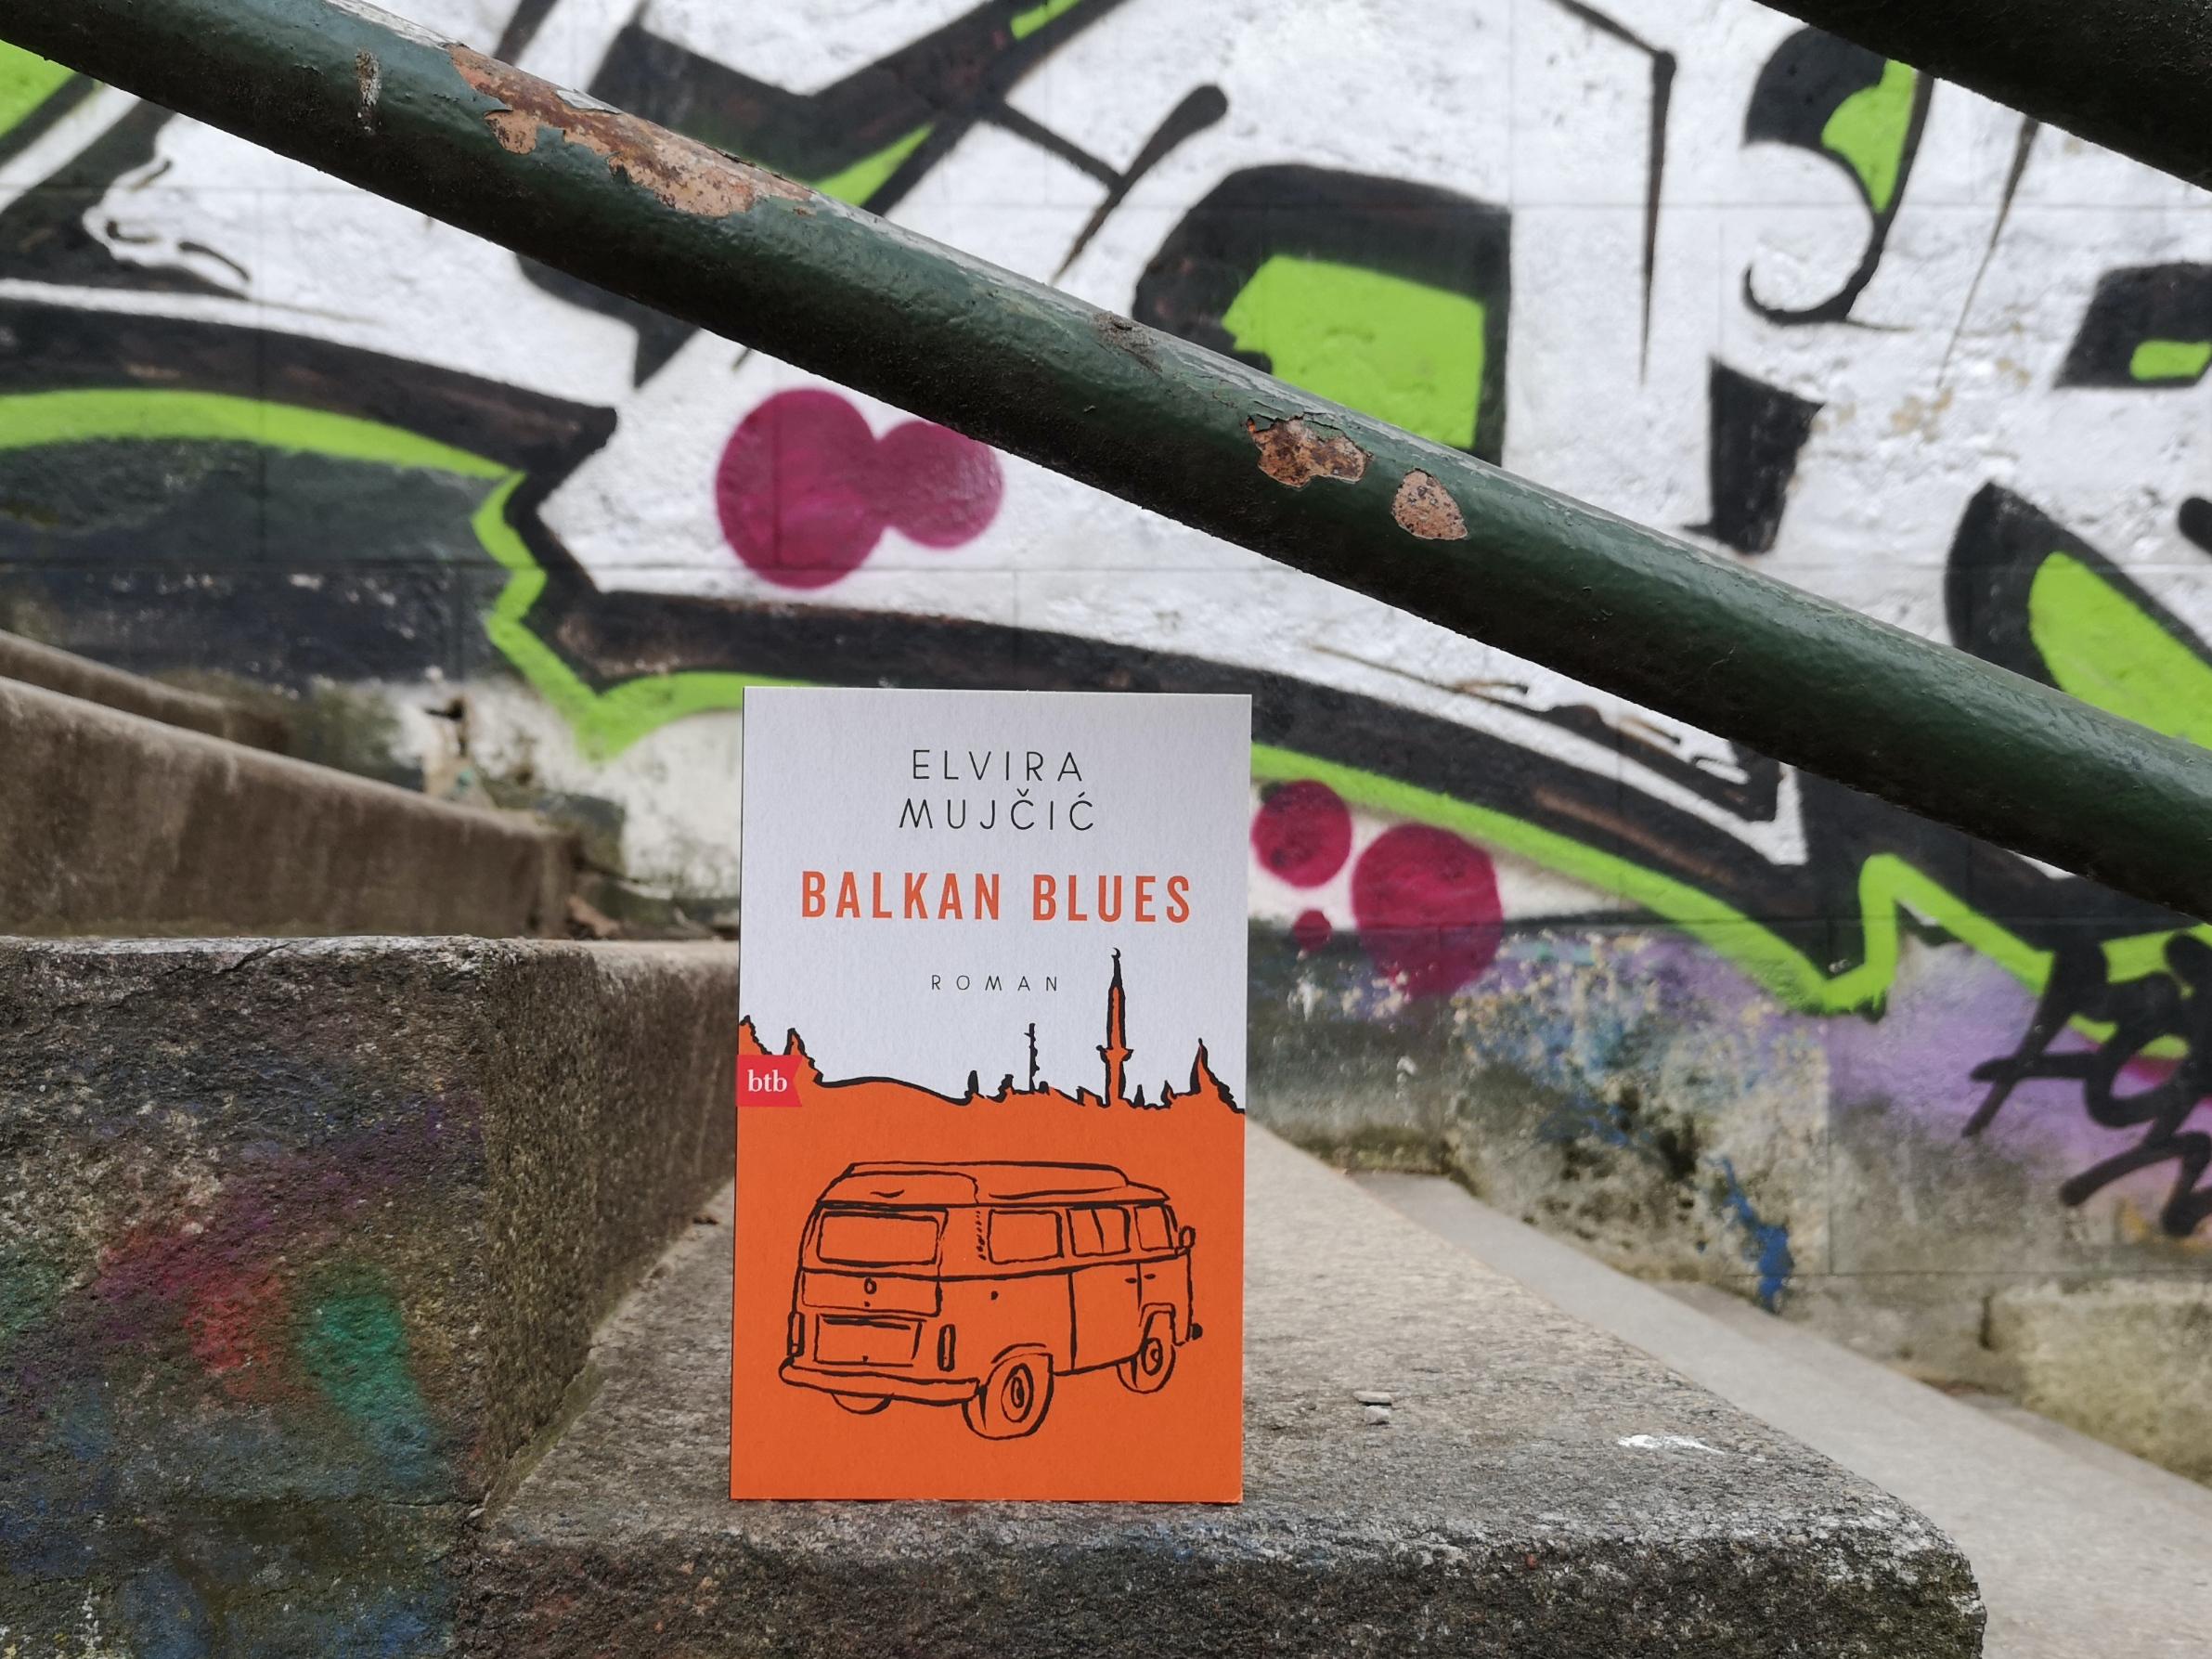 Tino-Schlench-Literaturpalast-Elvira Mujcic - Balkan Blues 2